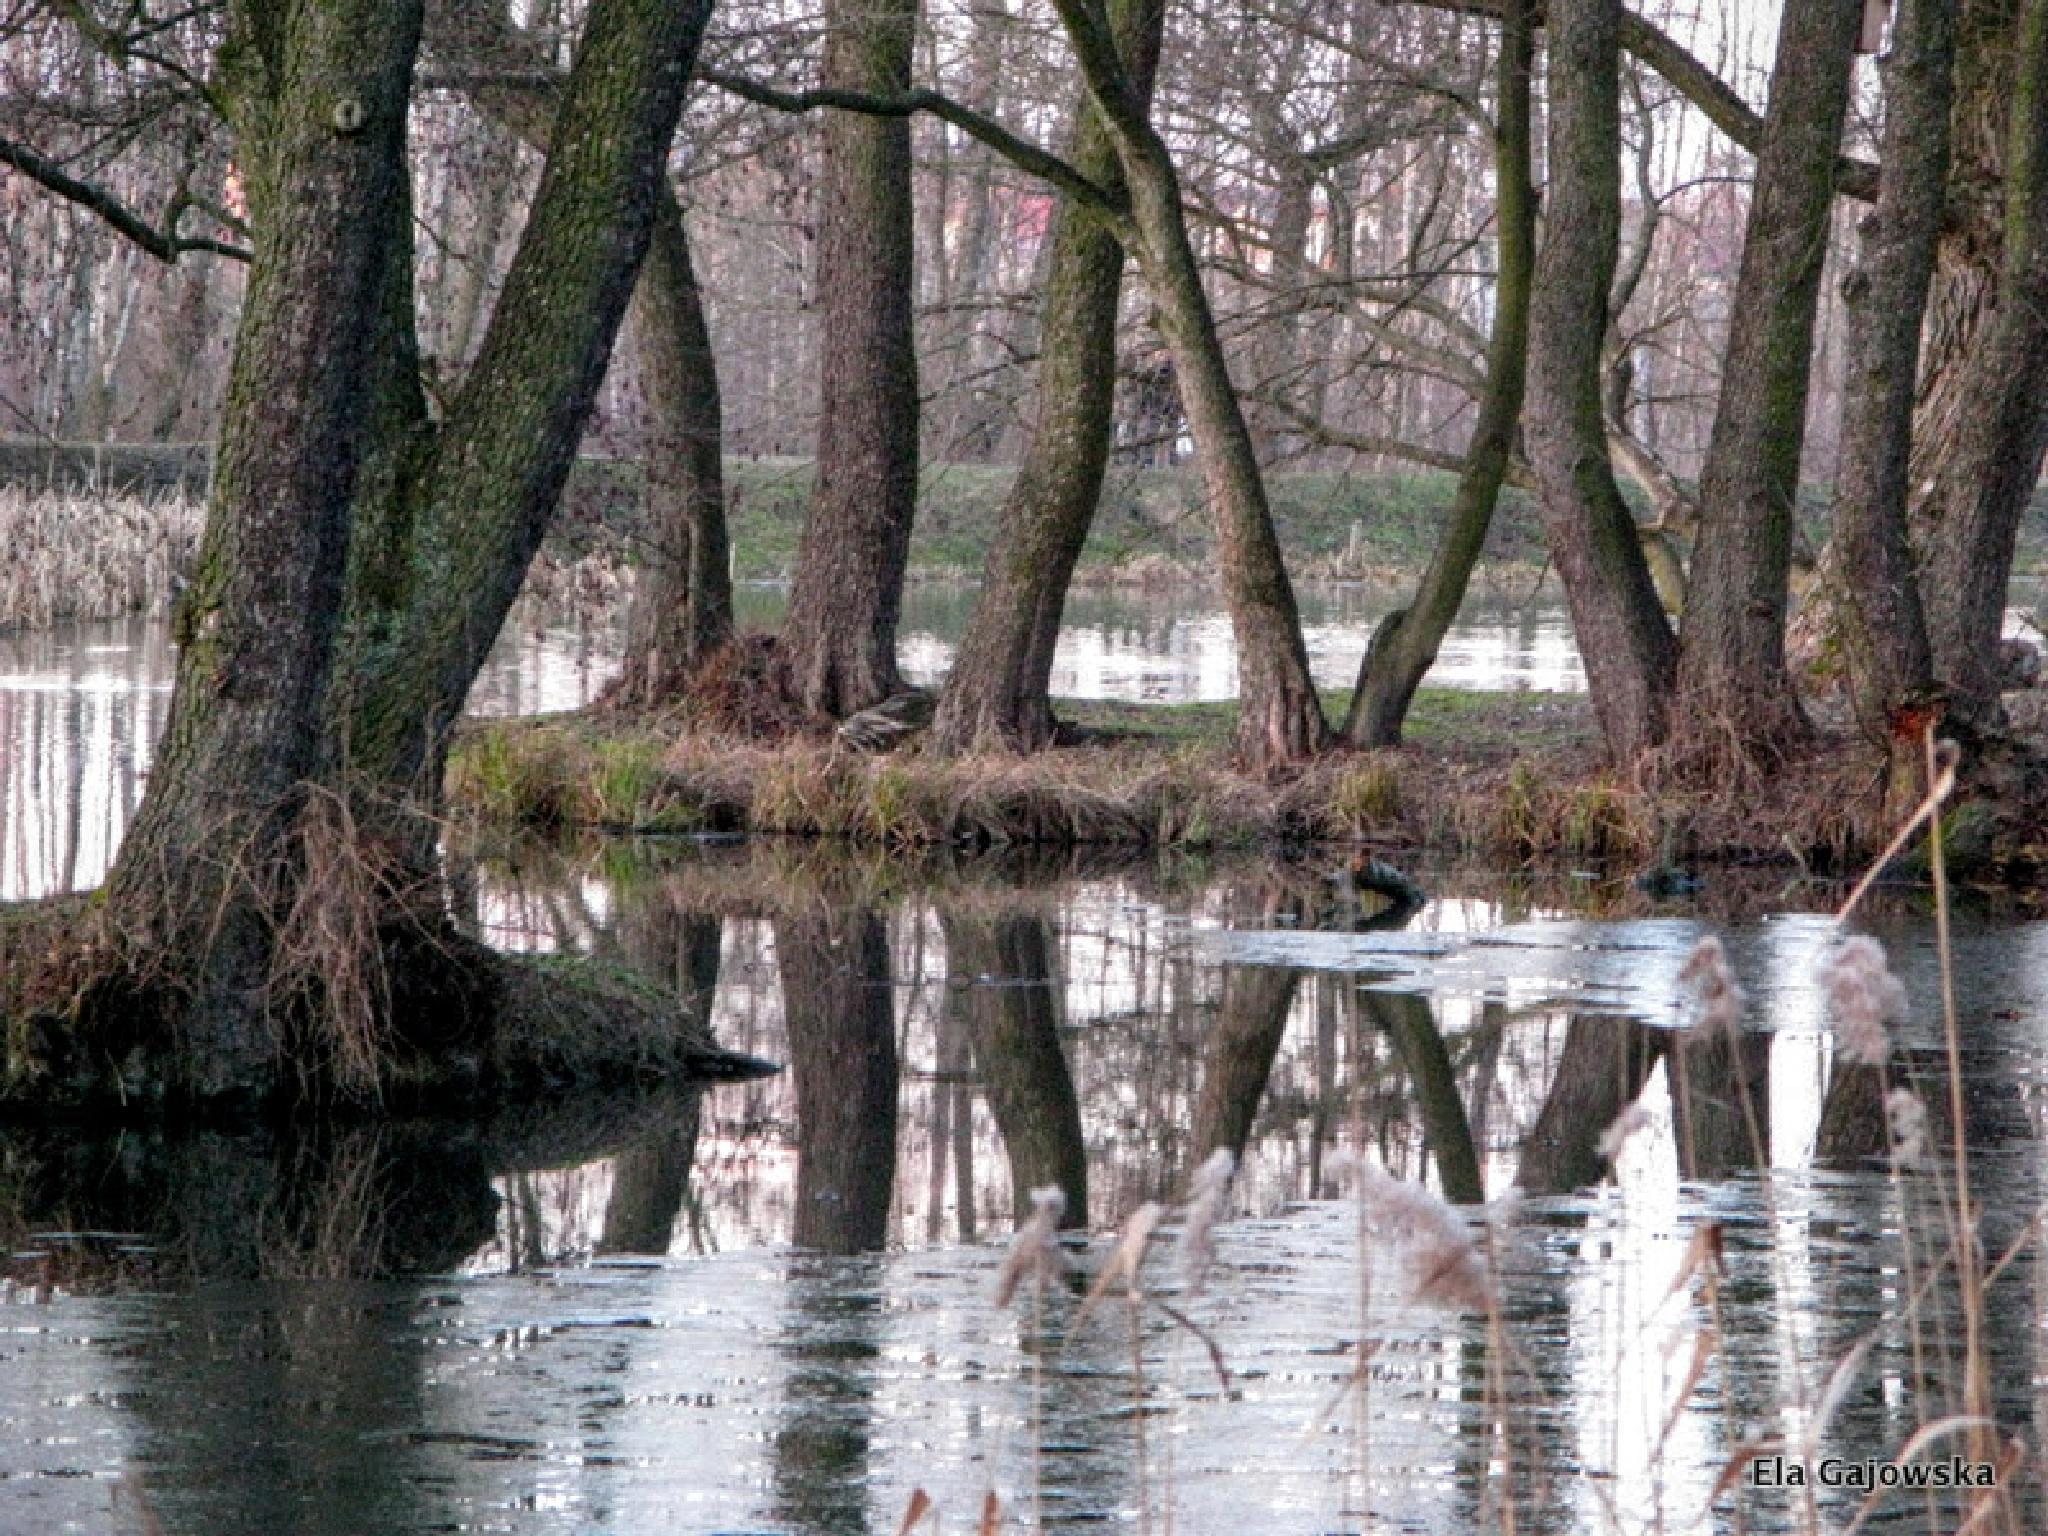 Reflection in icy water 2 by Ela Gajowska